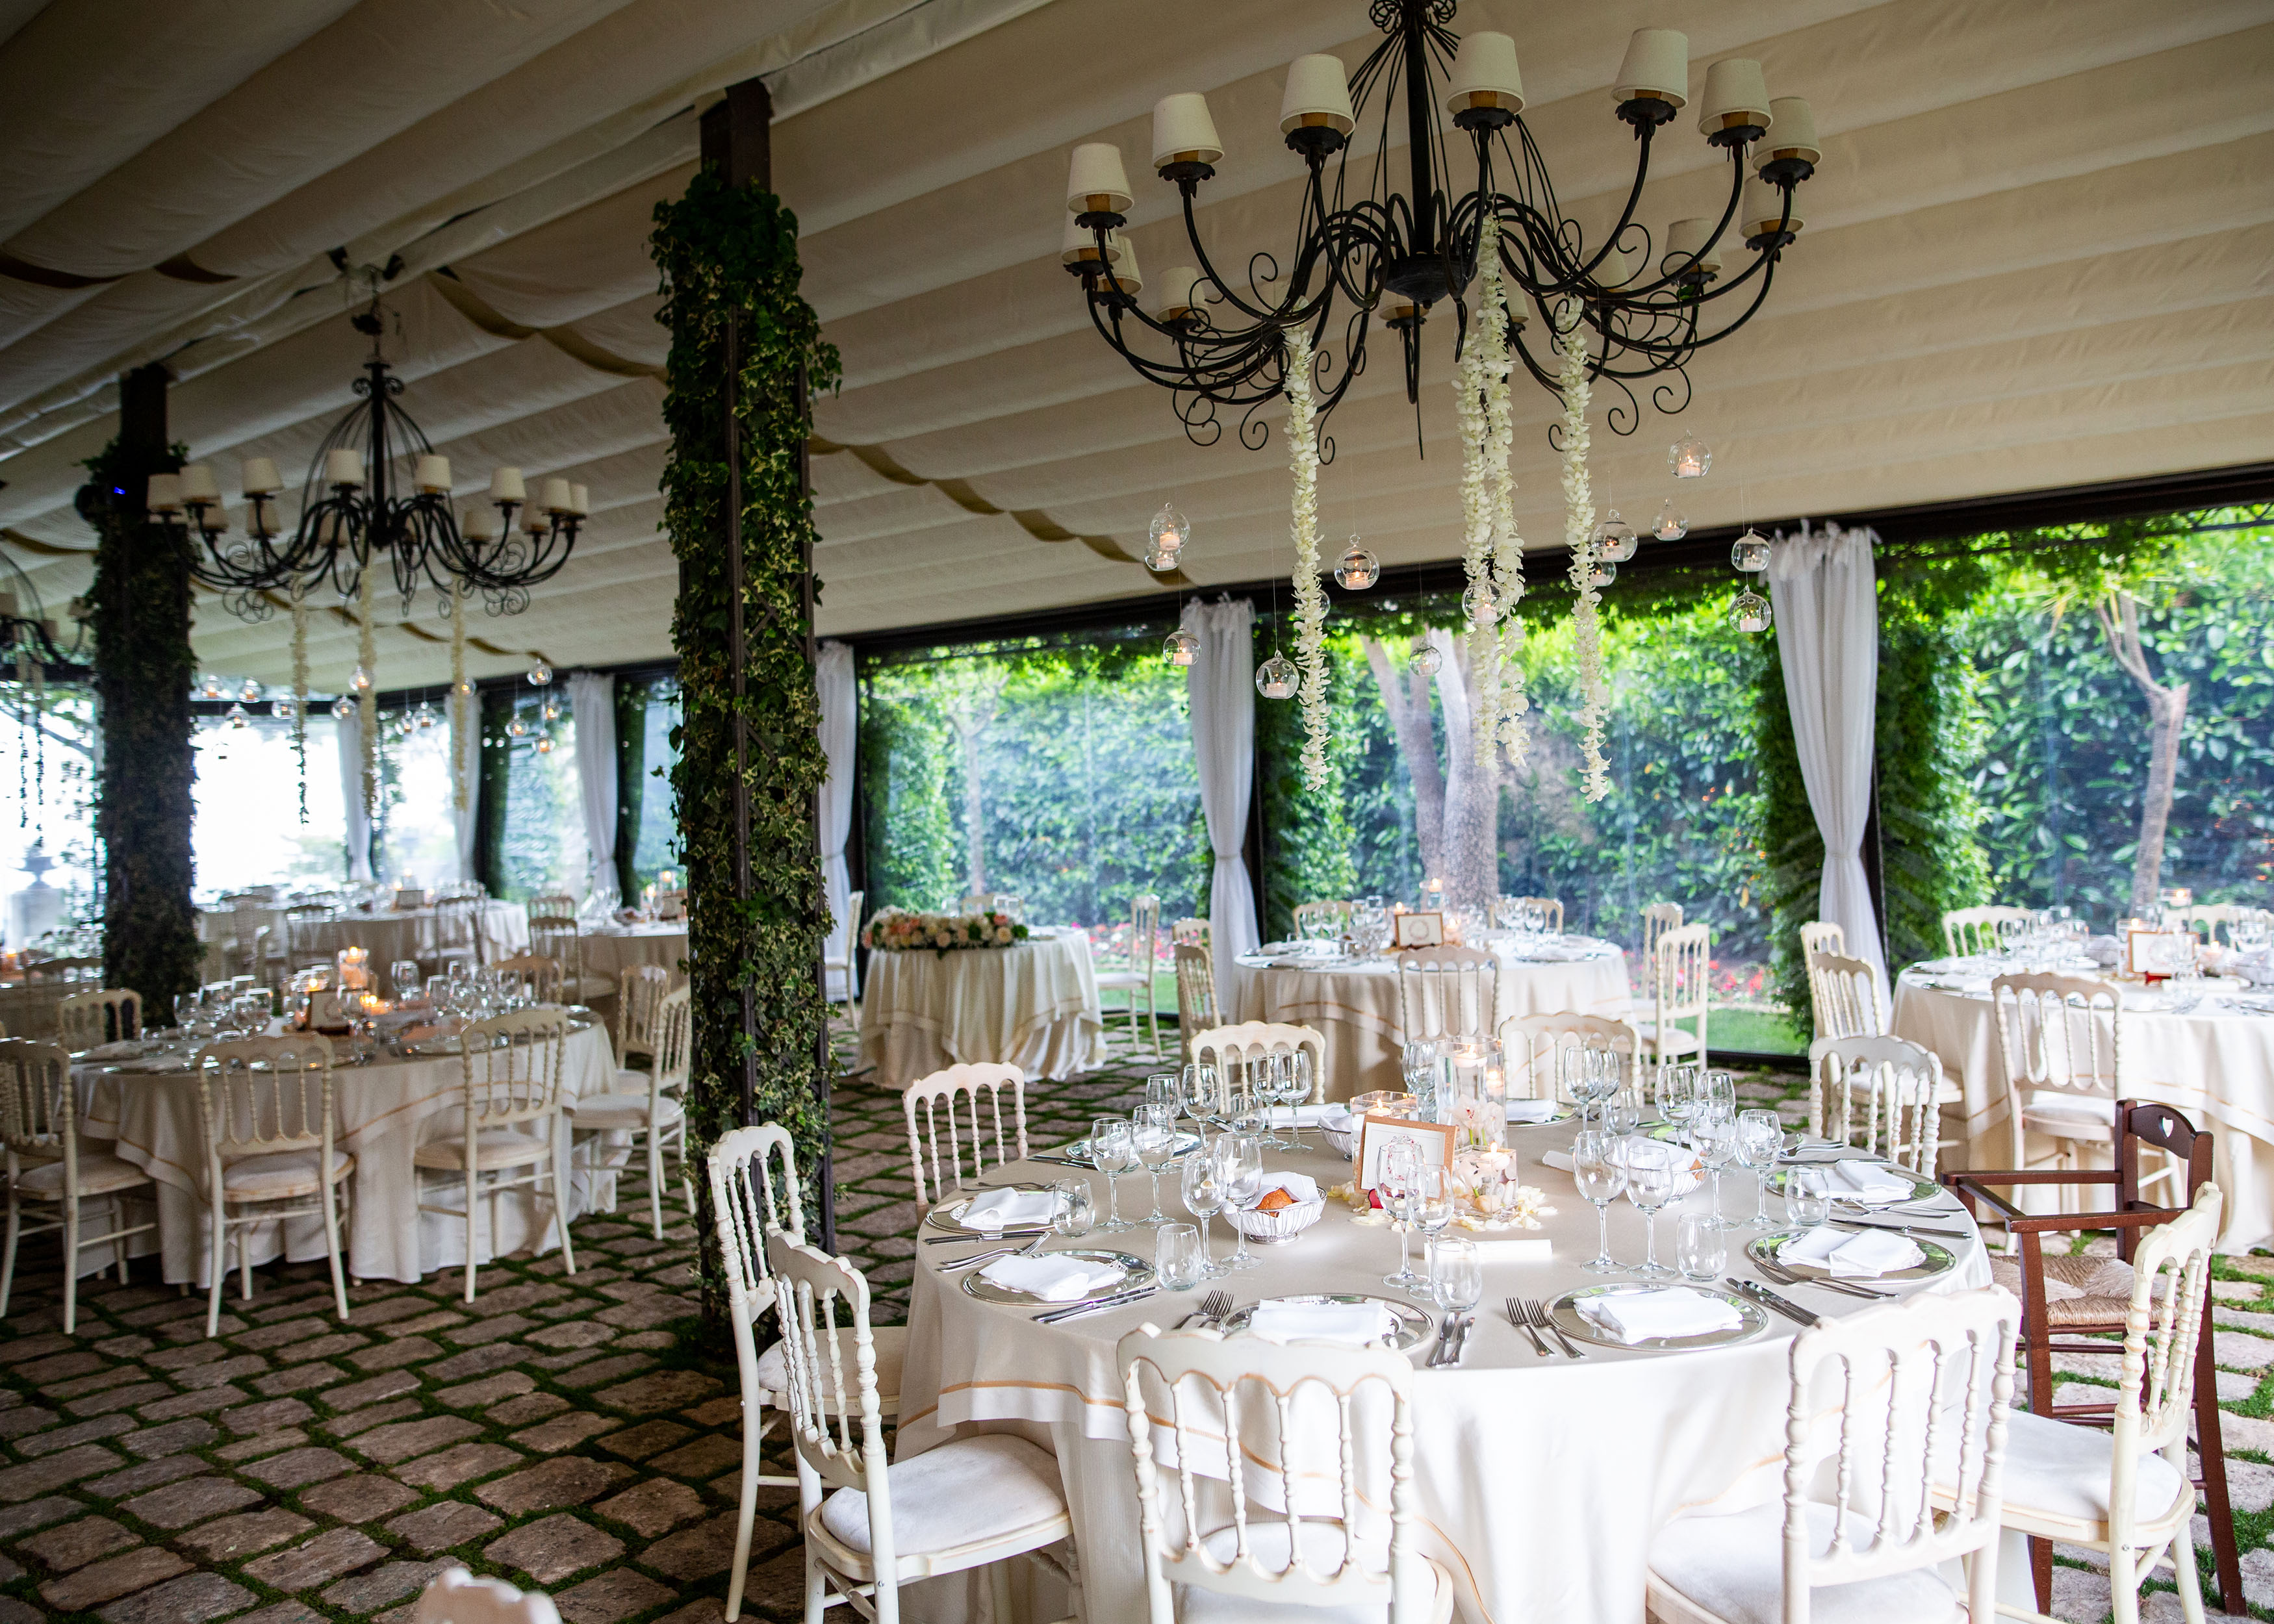 https://www.weddingamalfi.com/wp-content/uploads/Katia-Jorge-18-maggio-2019-42.jpg